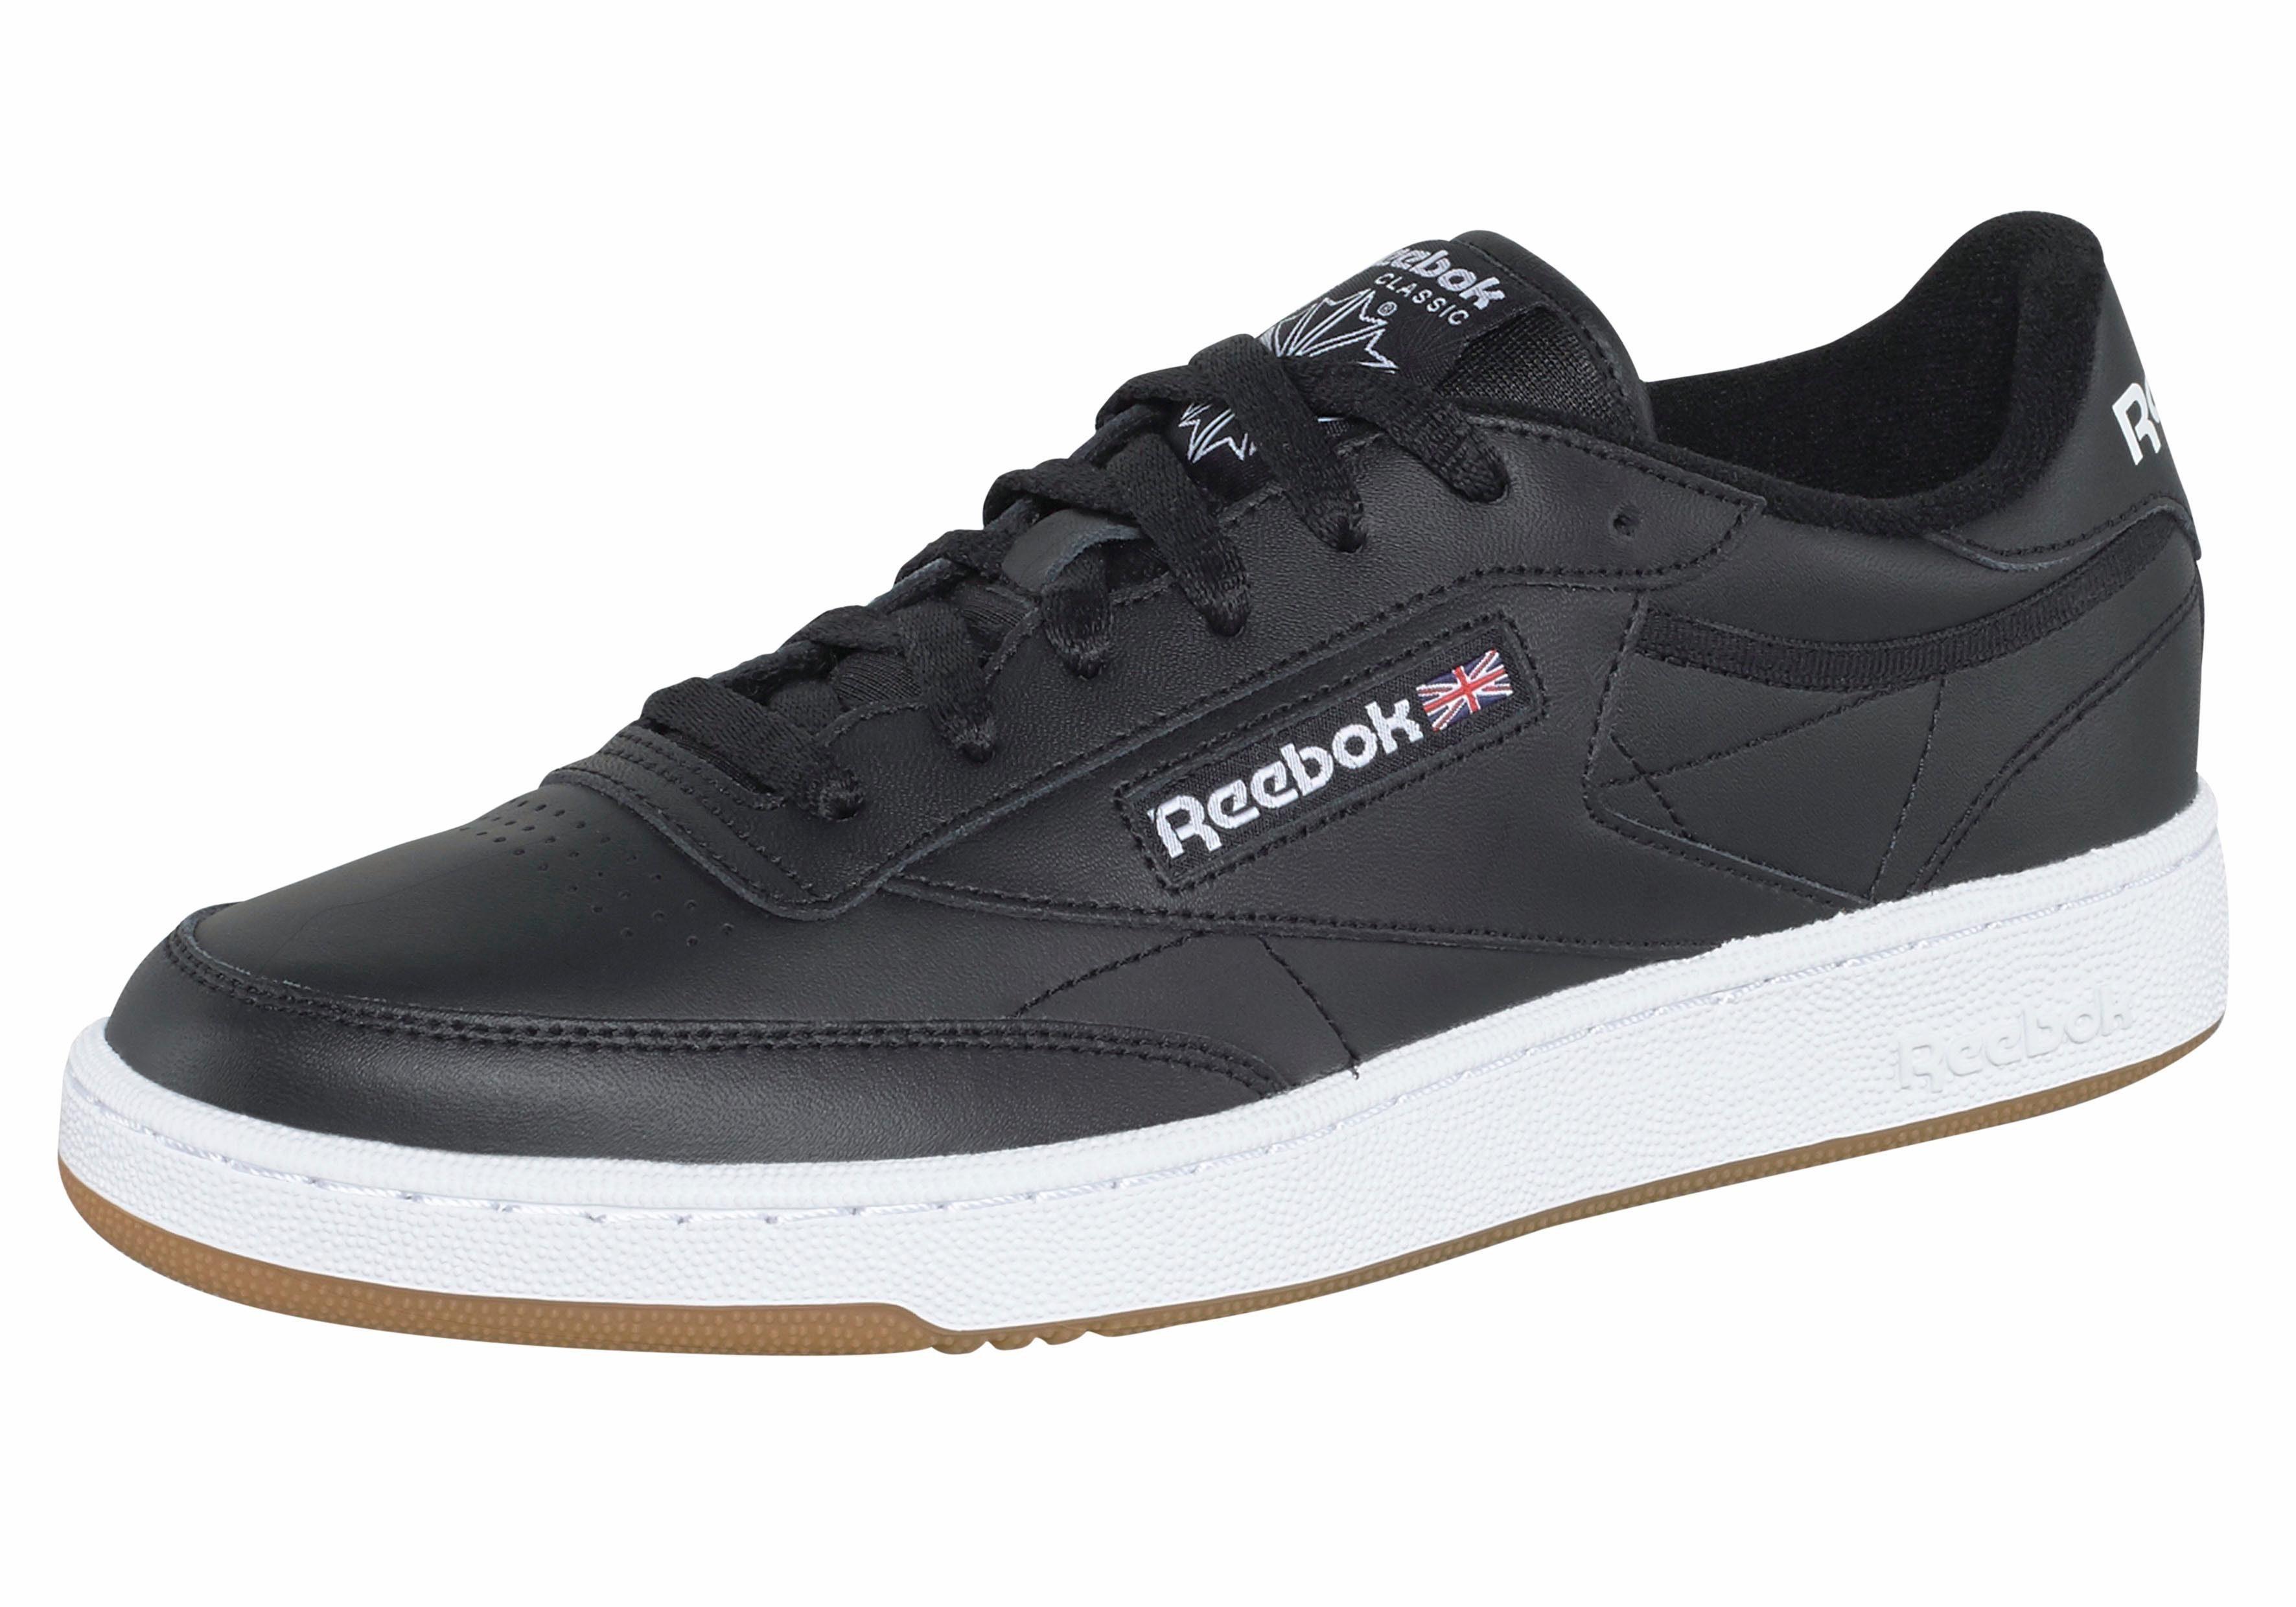 Reebok Classic »Club C 85« Sneaker, Atmungsaktives Obermaterial aus Leder online kaufen | OTTO